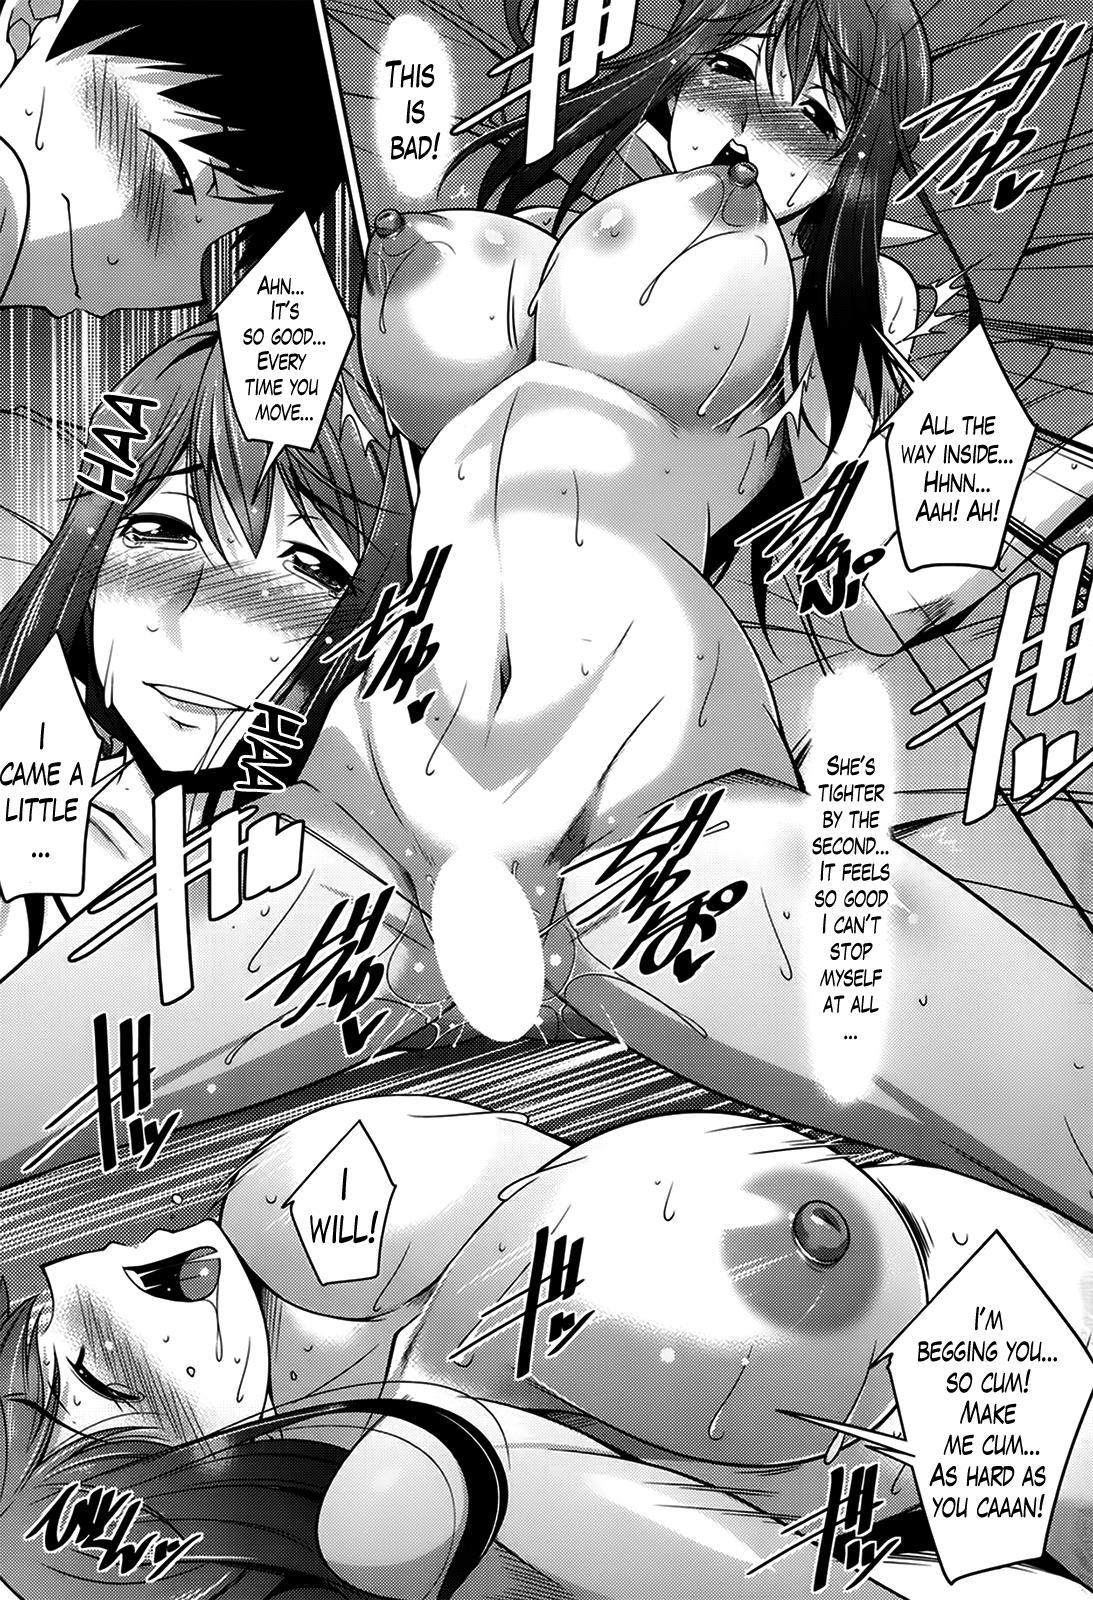 [Zen9] Taikutsu na Gogo no Sugoshikata Ch. 1-4   A Way to Spend a Boring Afternoon Ch. 1-4 (Action Pizazz DX 2013-12) [English](hentai2read.com)[Lazarus H] 72